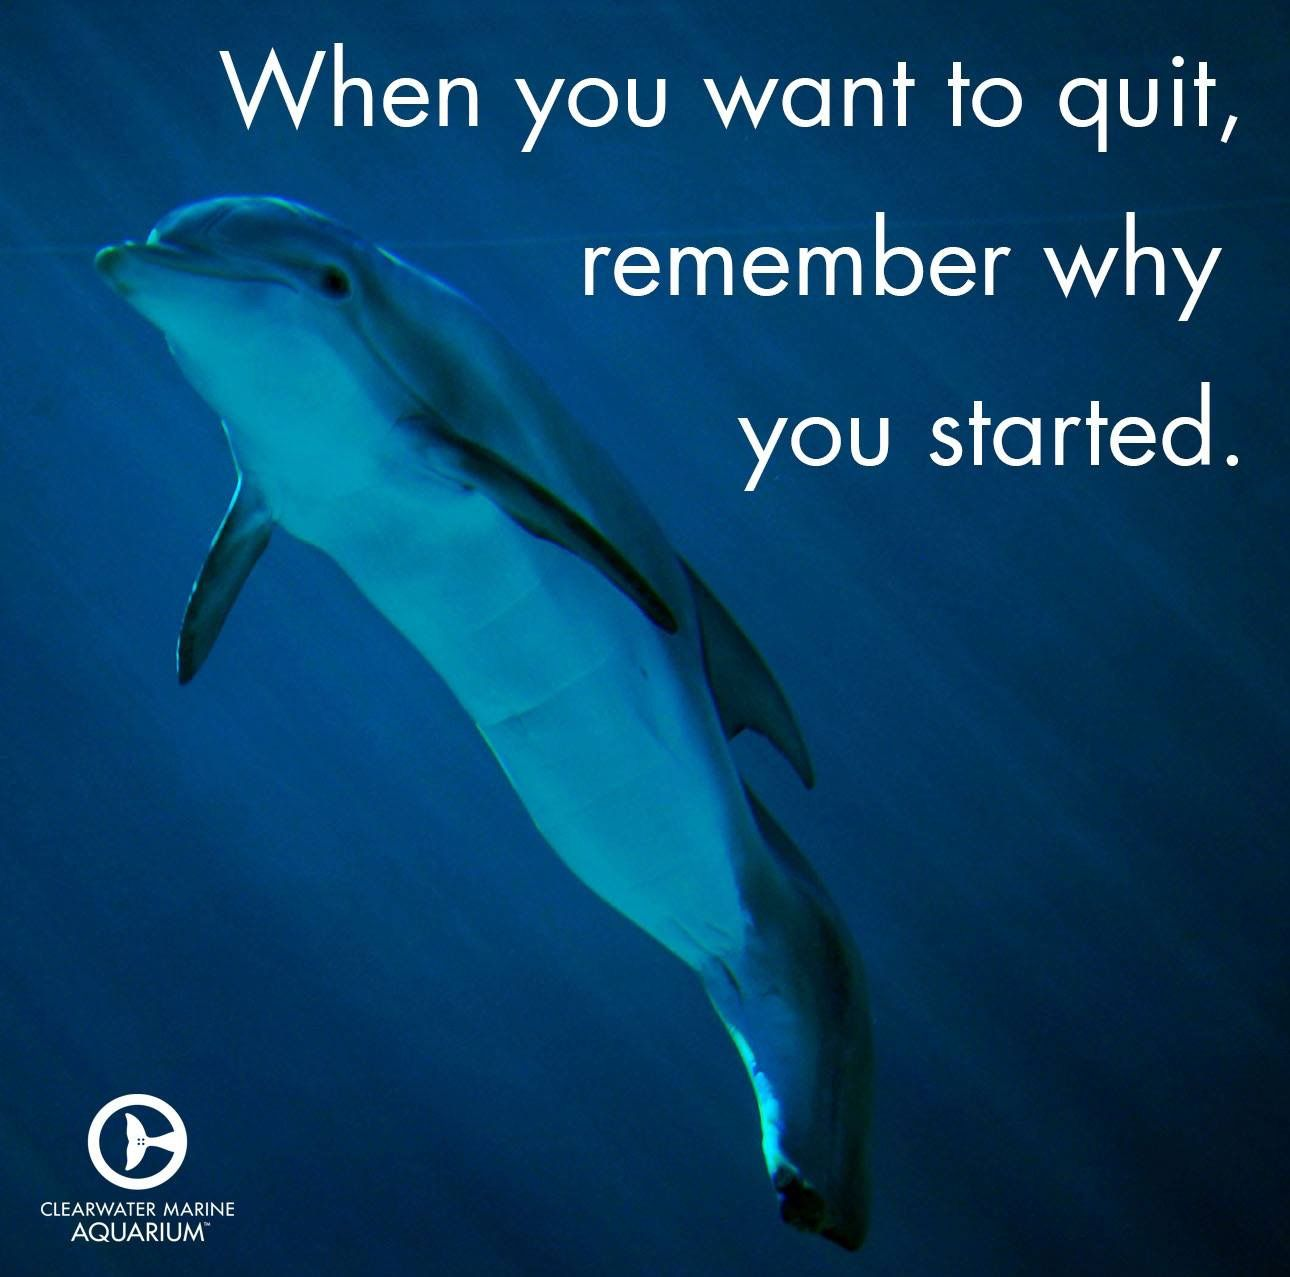 Fish aquarium quotes - Advice From A Dolphin Seems Legit